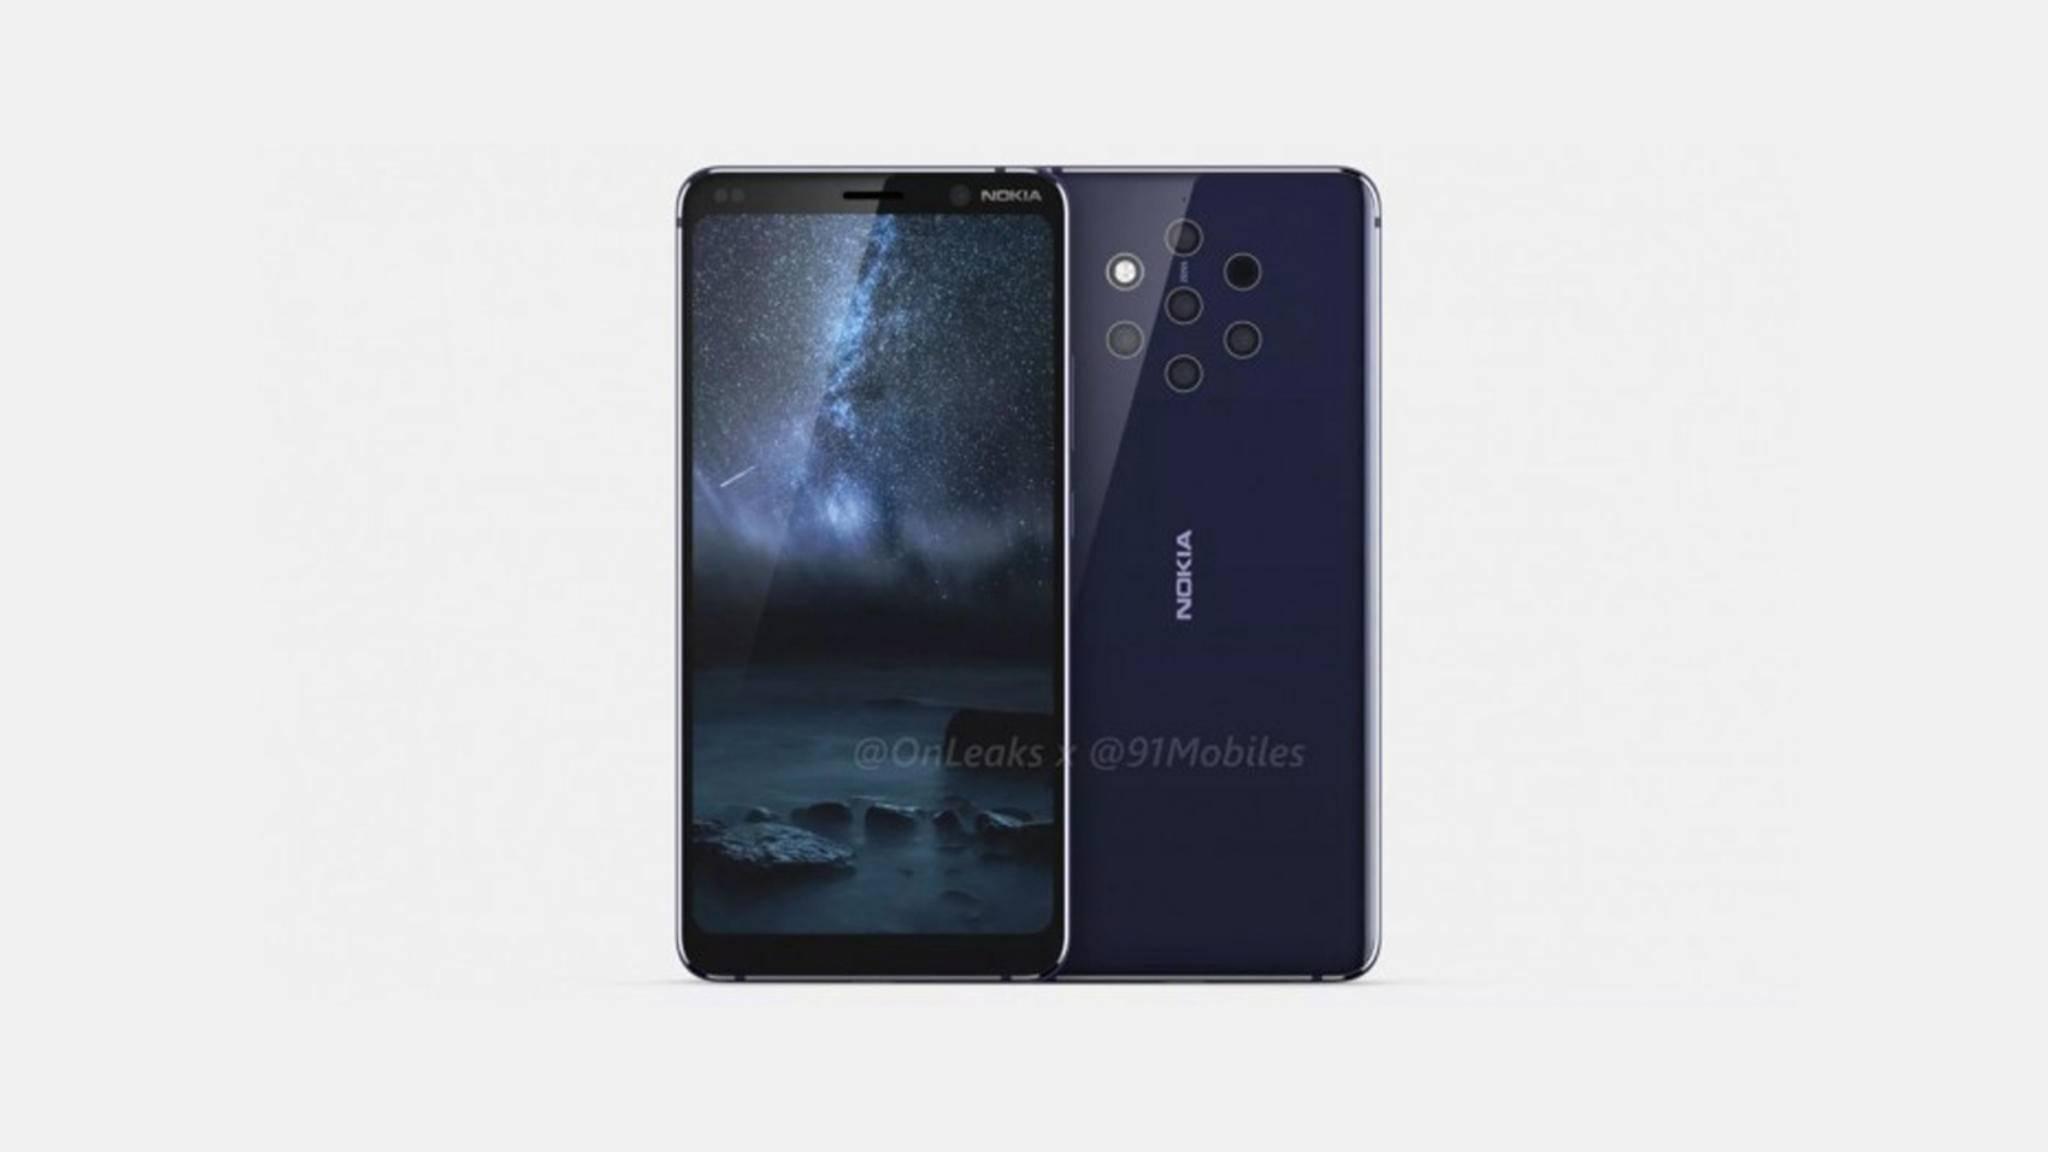 Das Nokia 9 PureView soll es mit anderen Top-Smartphones aufnehmen.